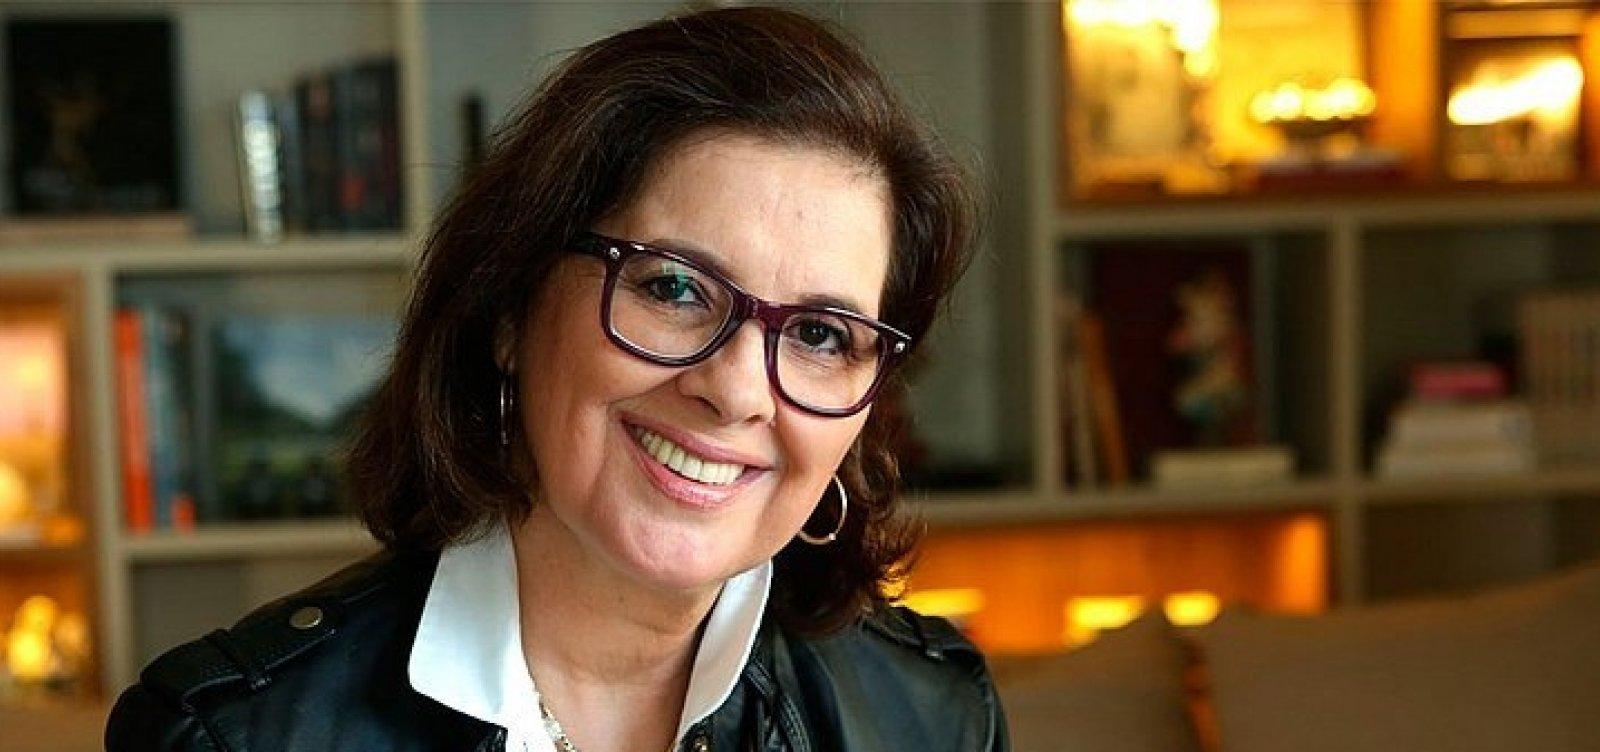 Criadora do Percpan, produtora Beth Cayres morre aos 60 anos